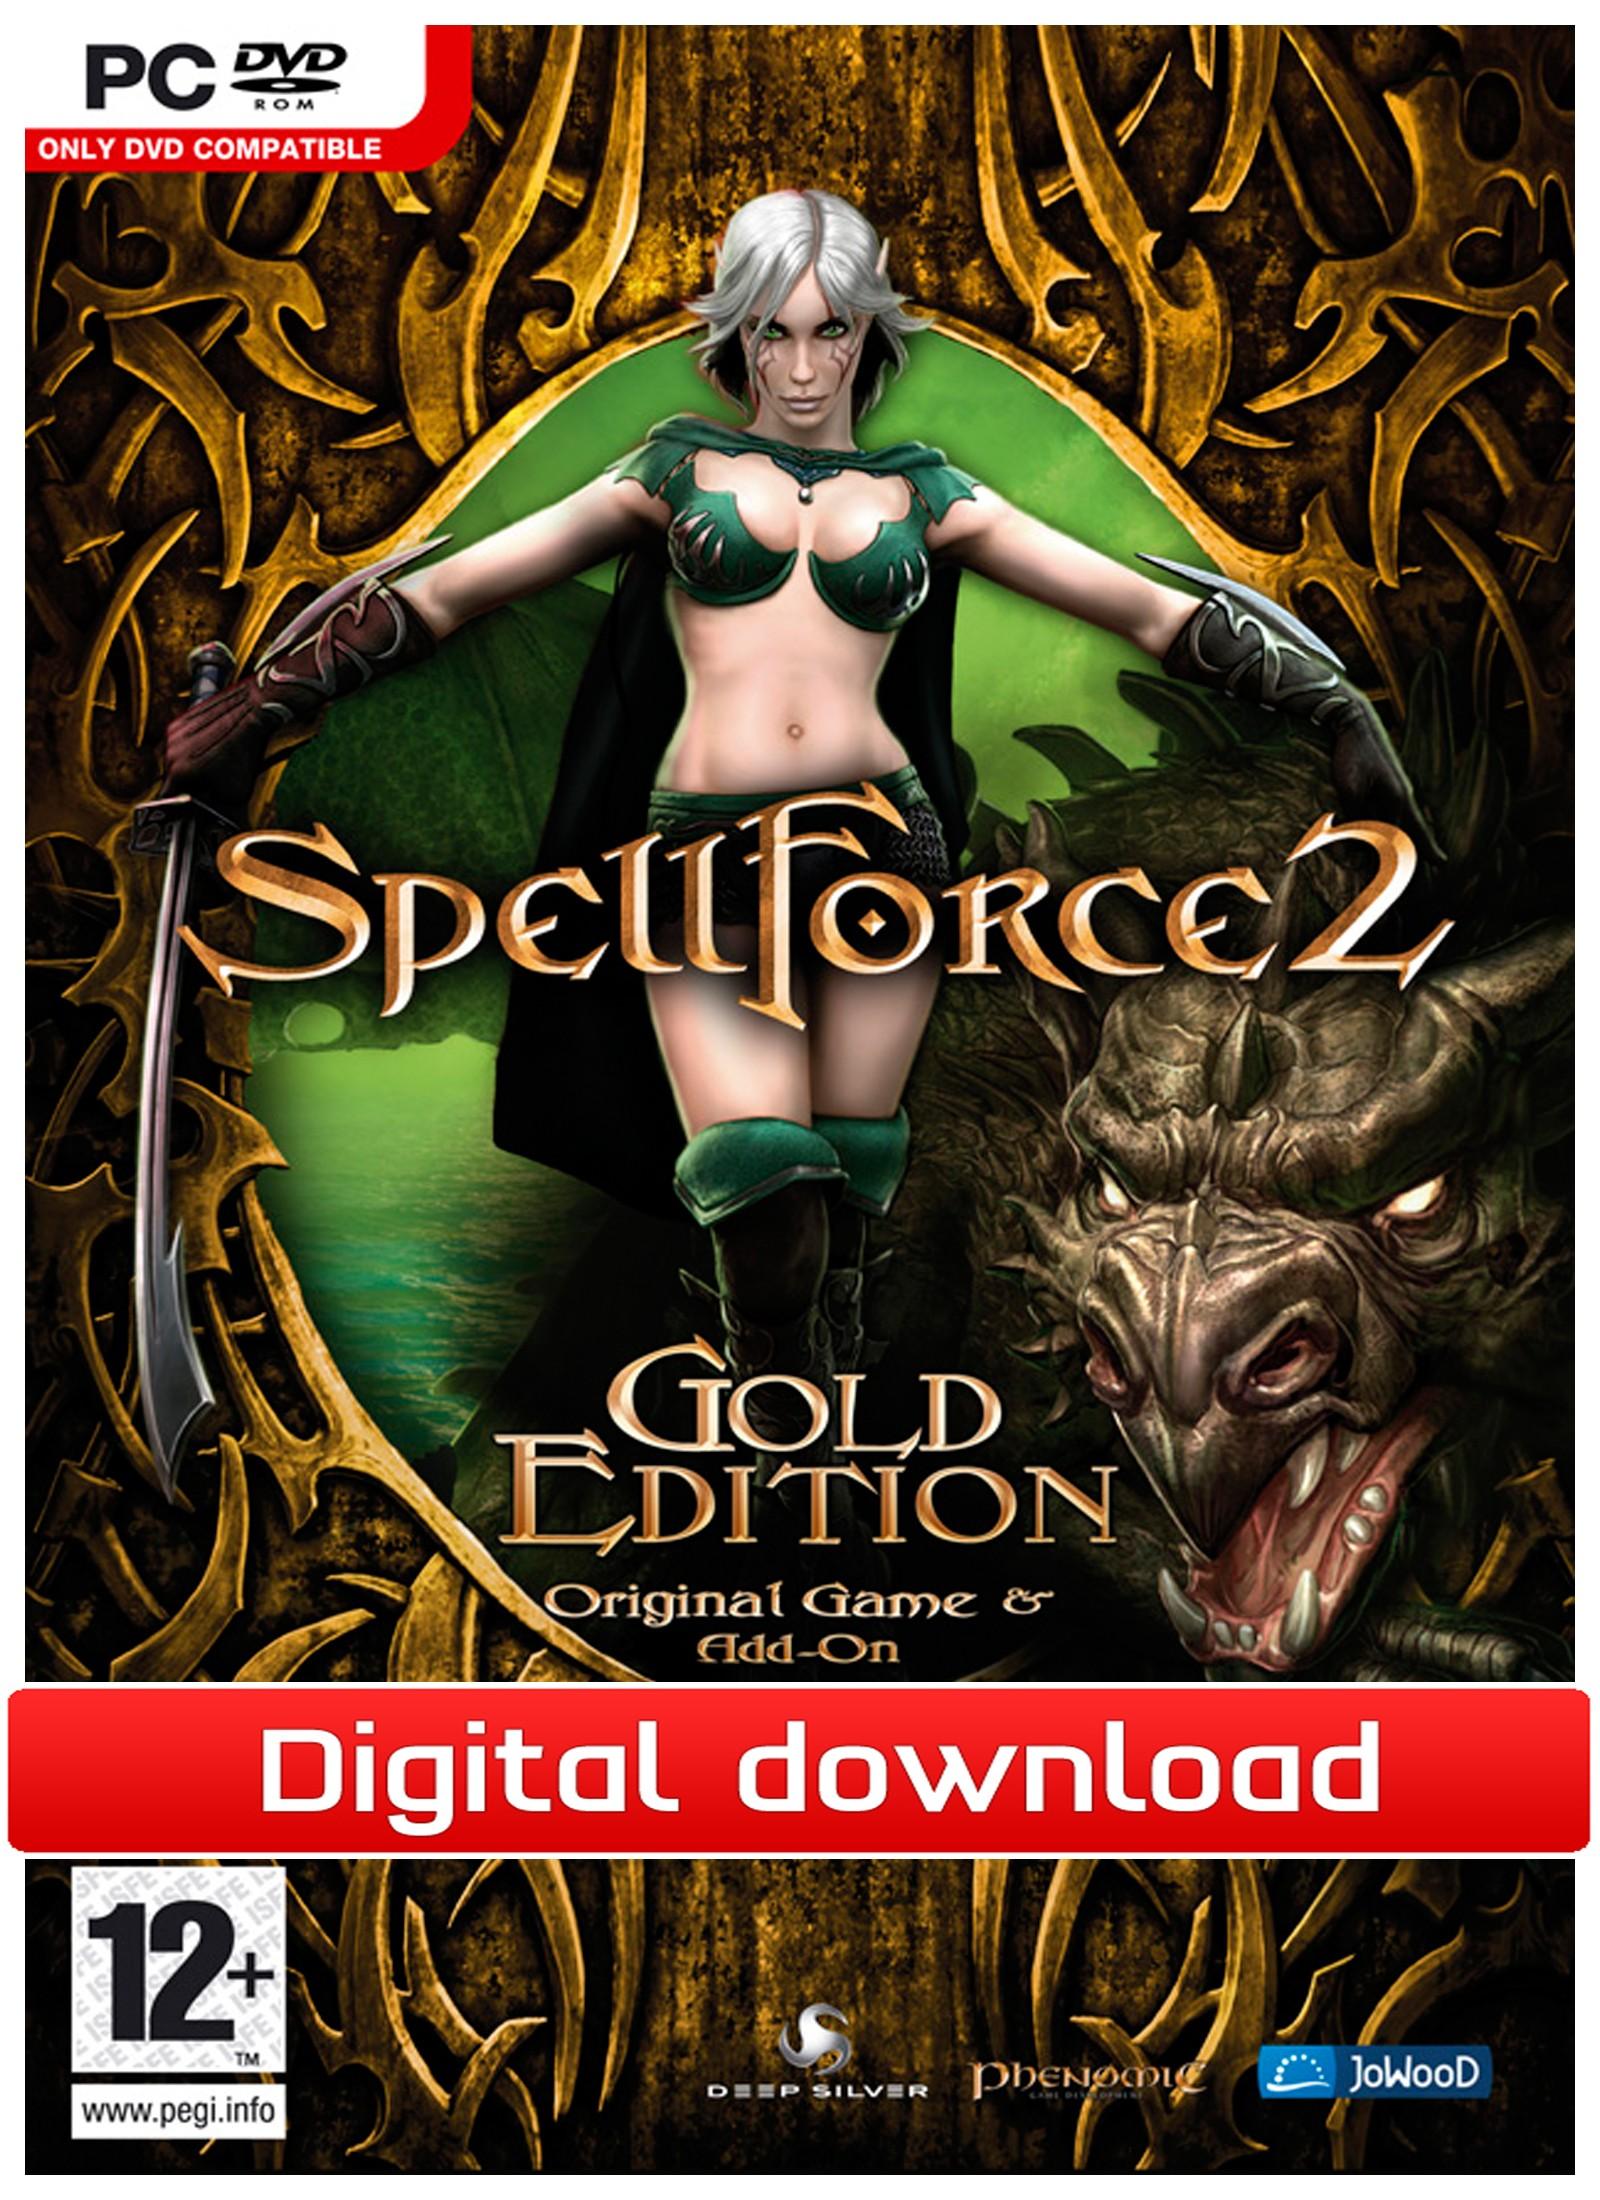 Spellforce 2 Gold (PC nedlastning) PCDD34820